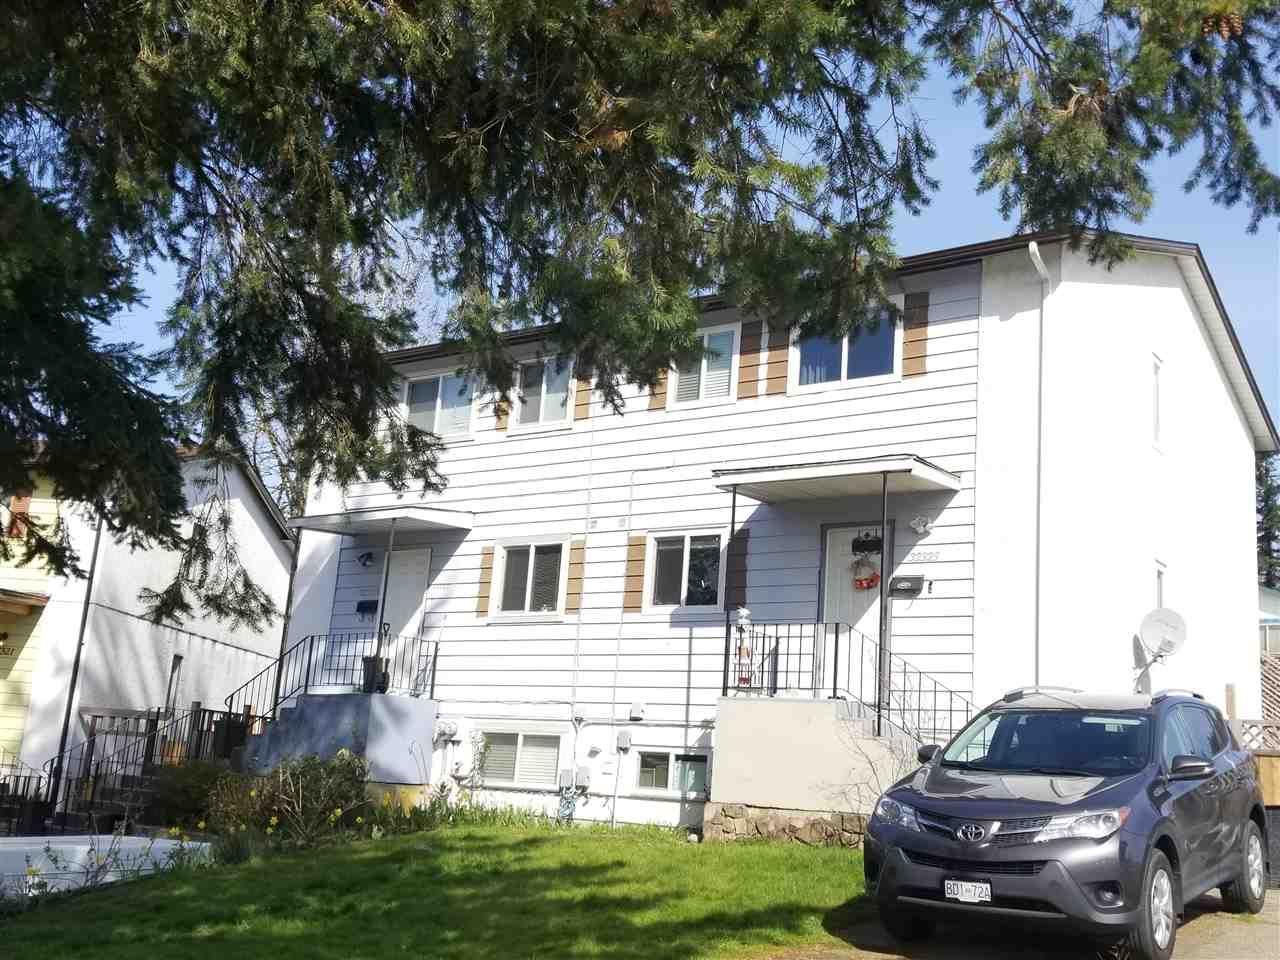 Main Photo: 32325 BRANT Avenue in Mission: Mission BC 1/2 Duplex for sale : MLS®# R2563803